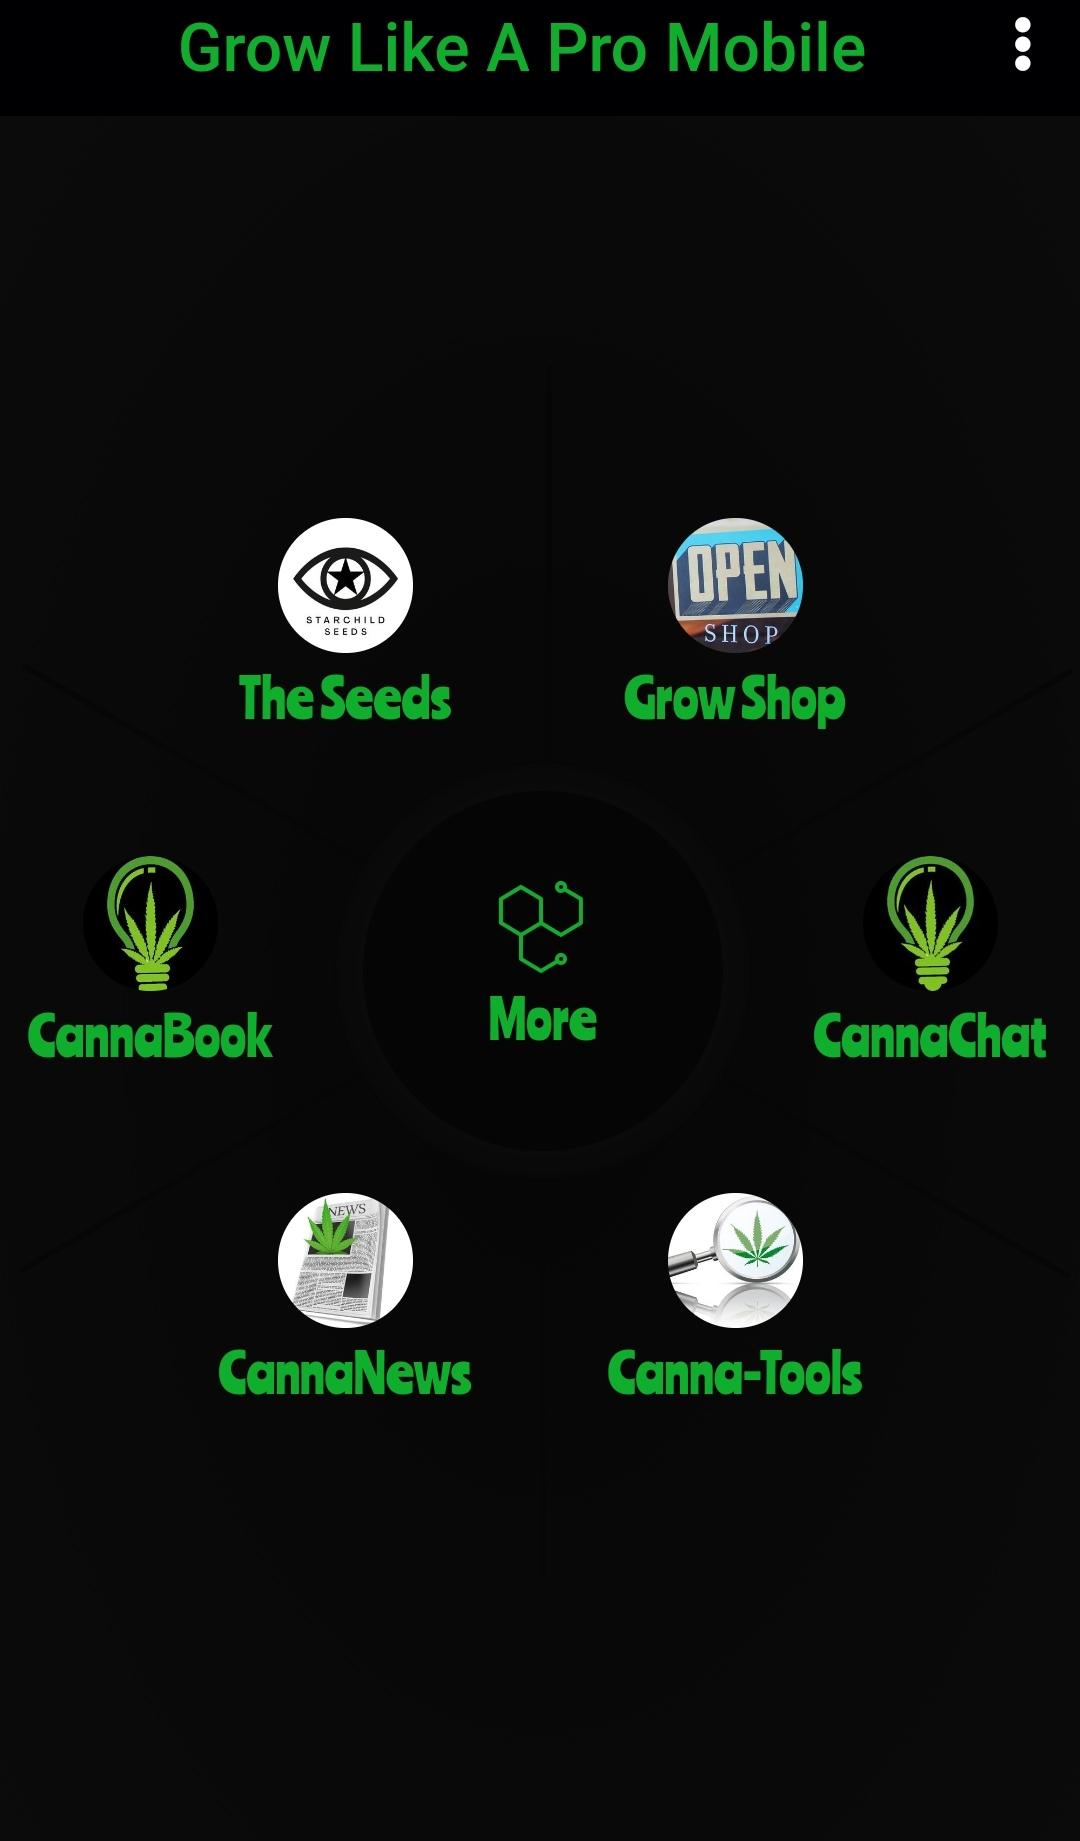 Image of the Grow Like a pro app set-up